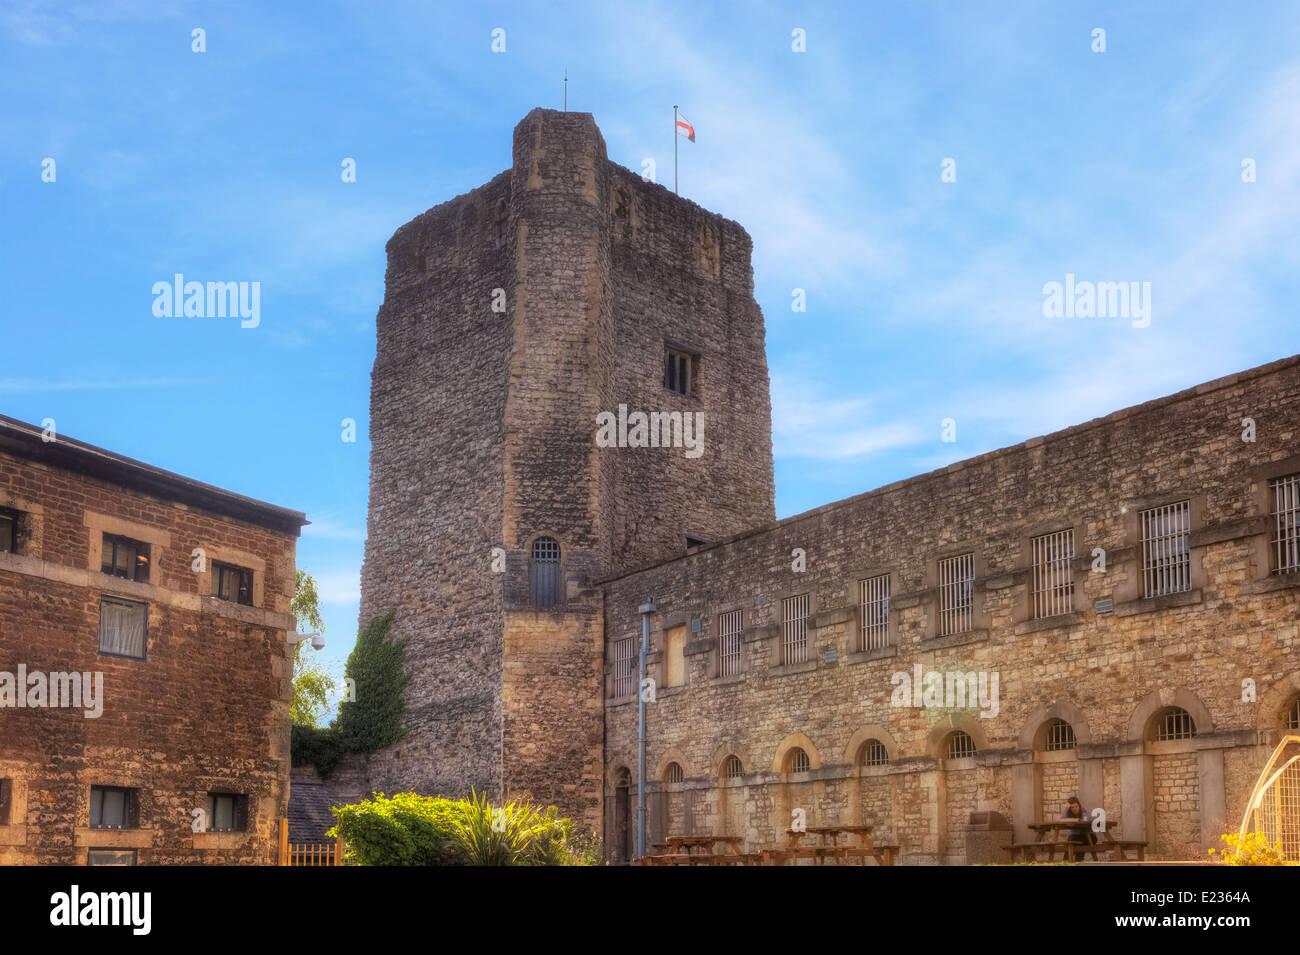 Oxford Castle, Oxford, Oxfordshire, England, United Kingdom - Stock Image